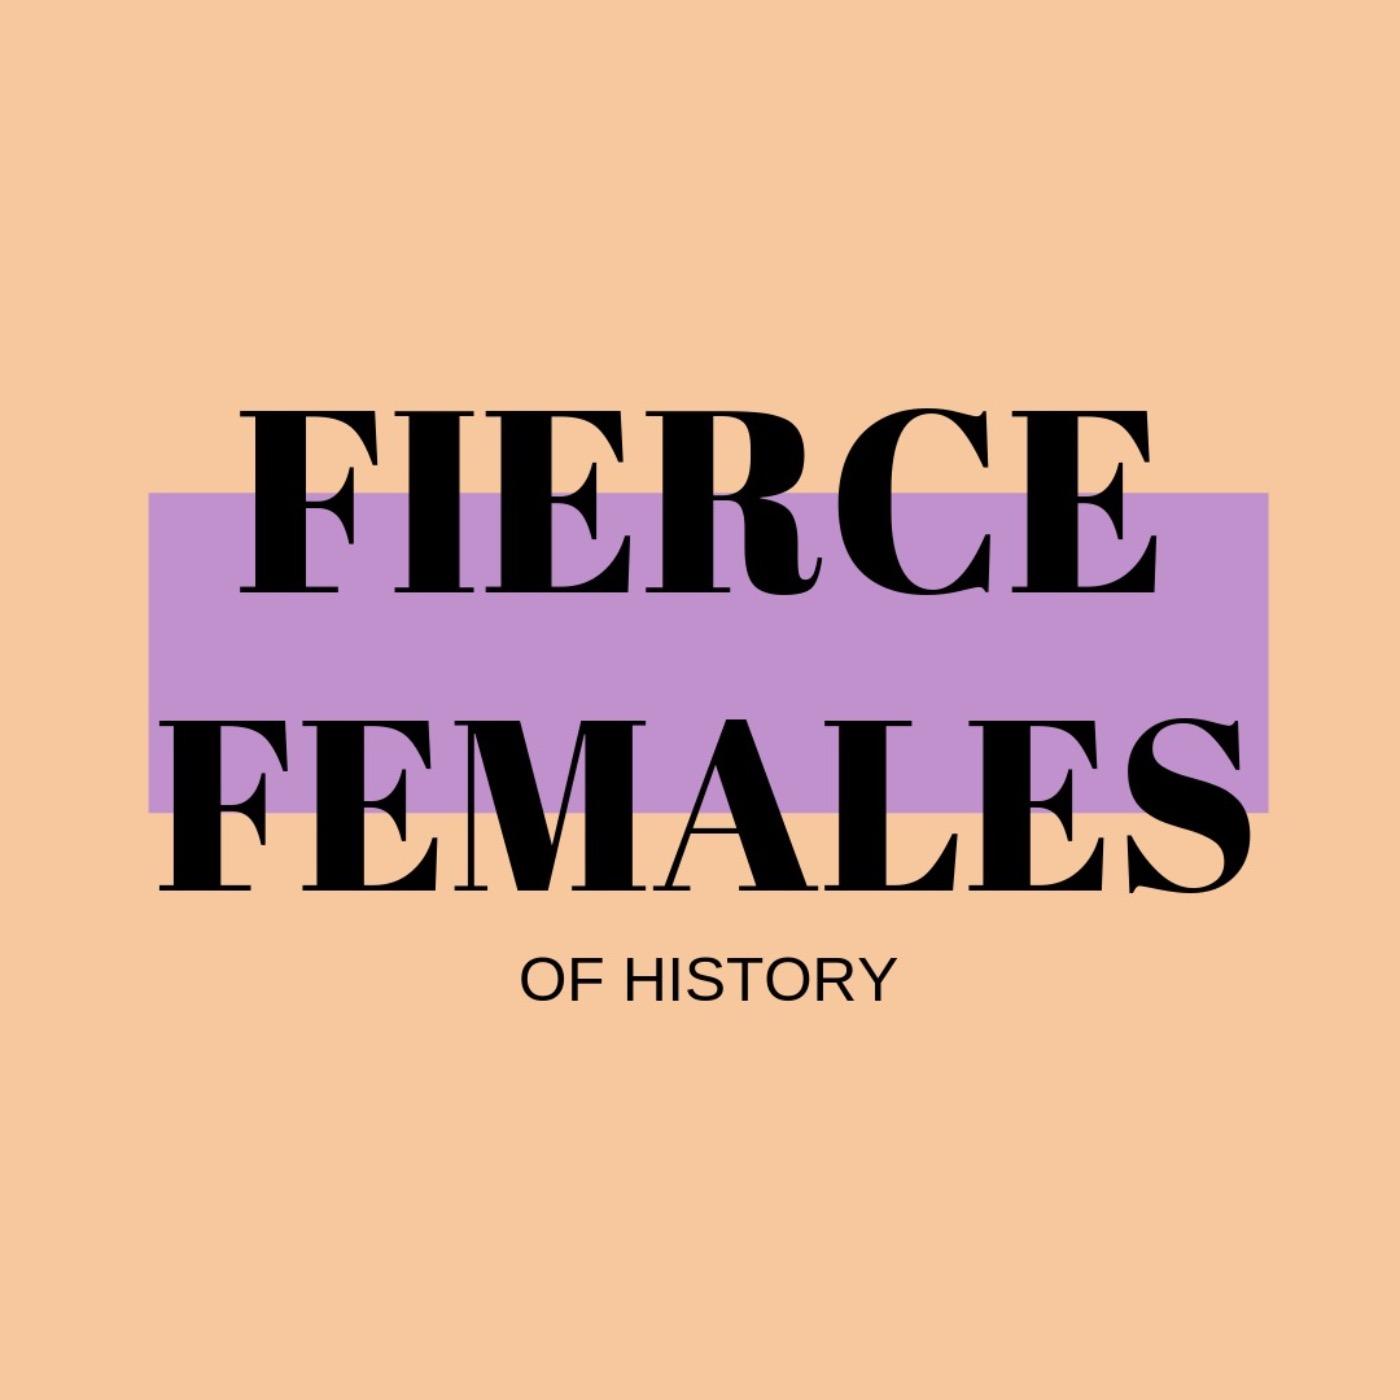 Fierce Females of History